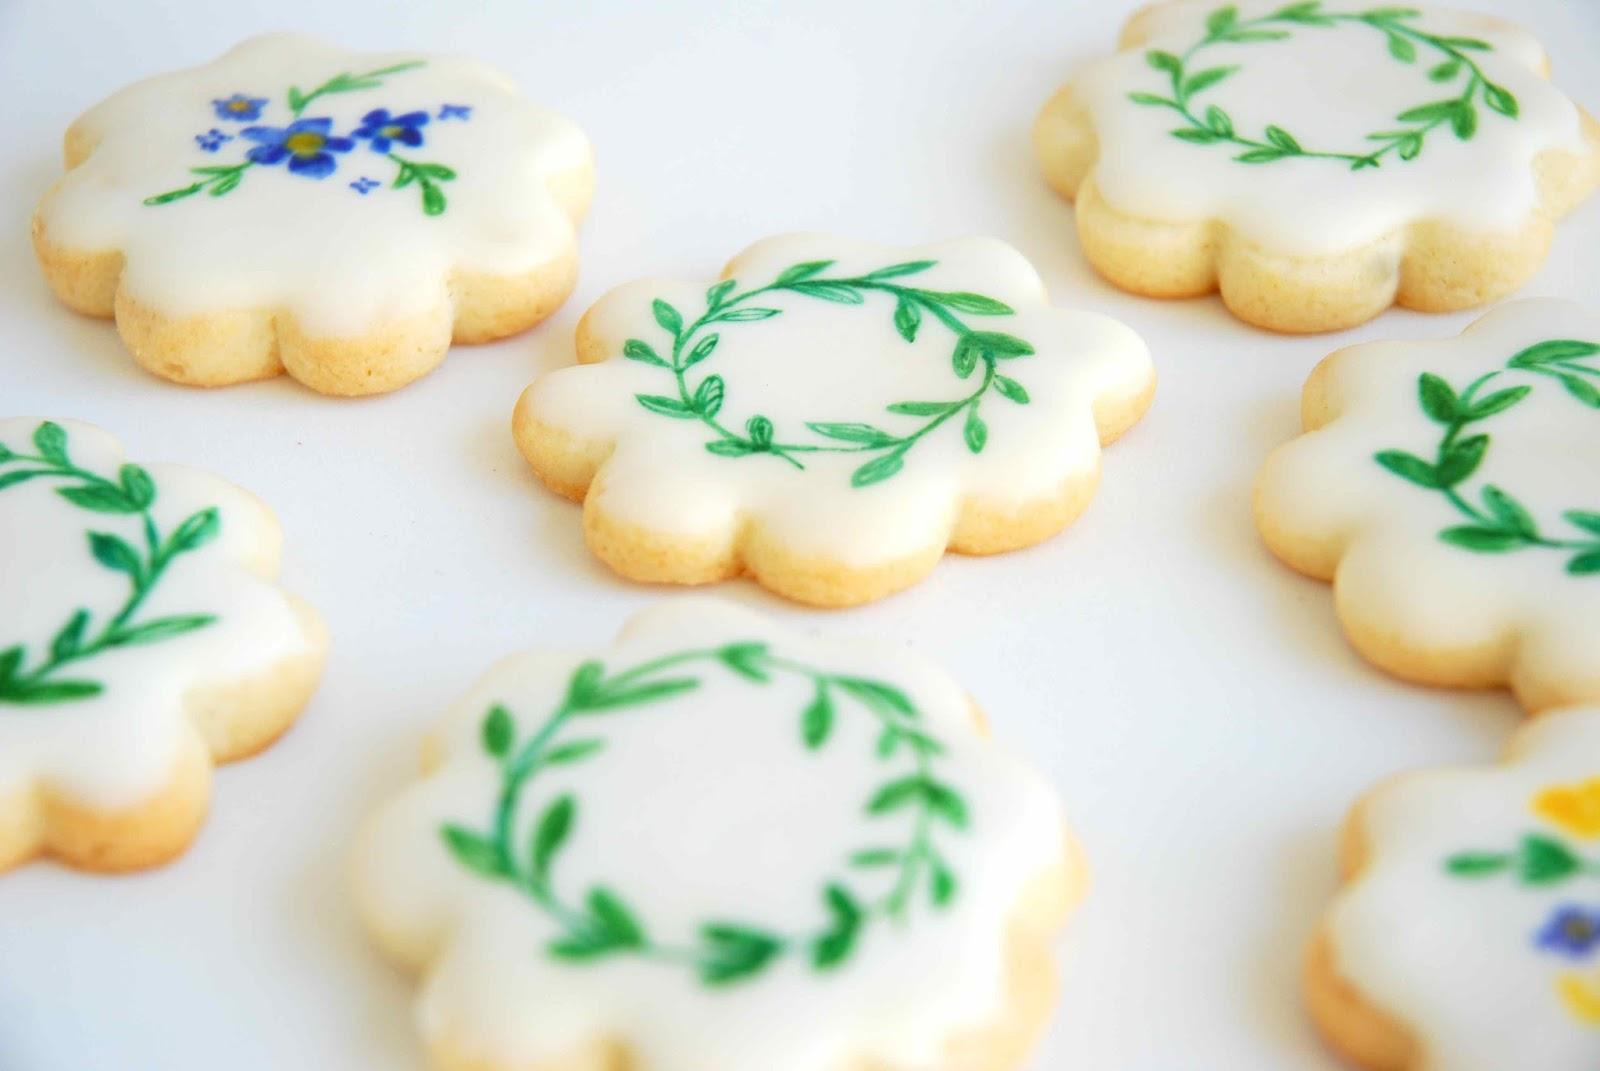 Shayda Campbell: Porcelain Sugar Cookies